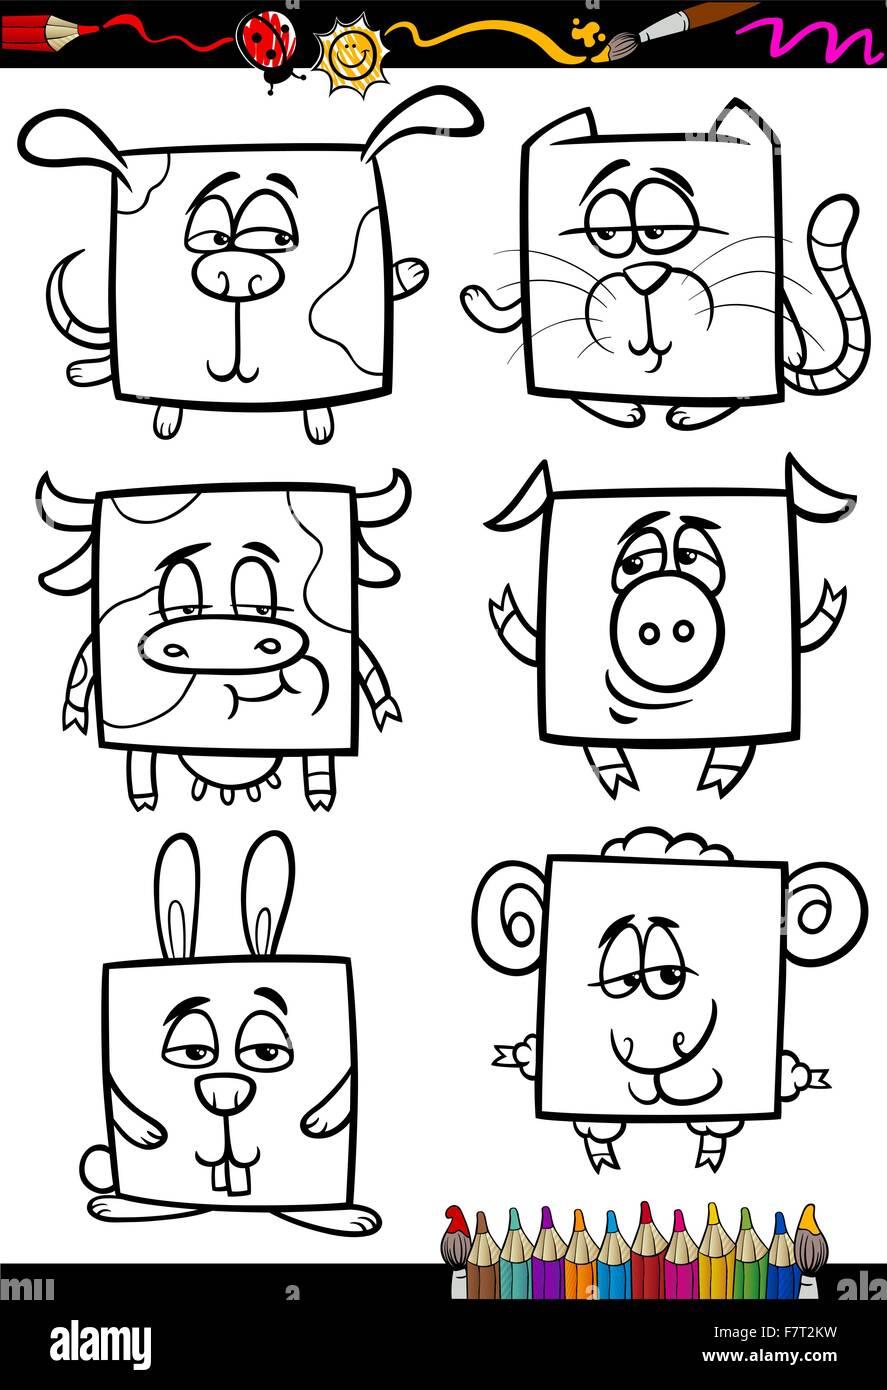 süße Tiere Cartoon-Malbuch Vektor Abbildung - Bild: 90883405 - Alamy